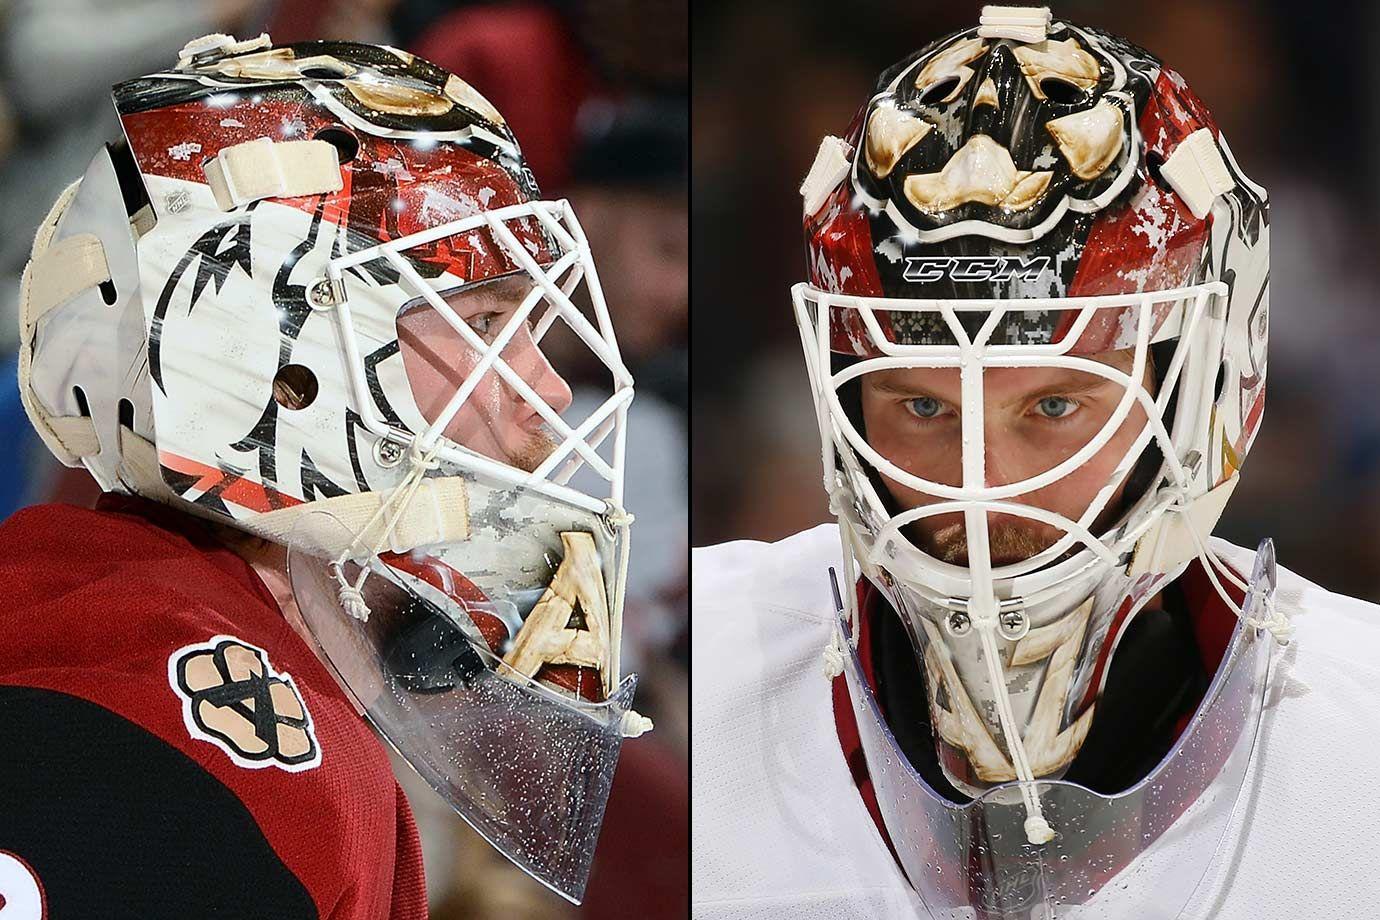 NHL Goalie Masks by Team (2016)(이미지 포함)